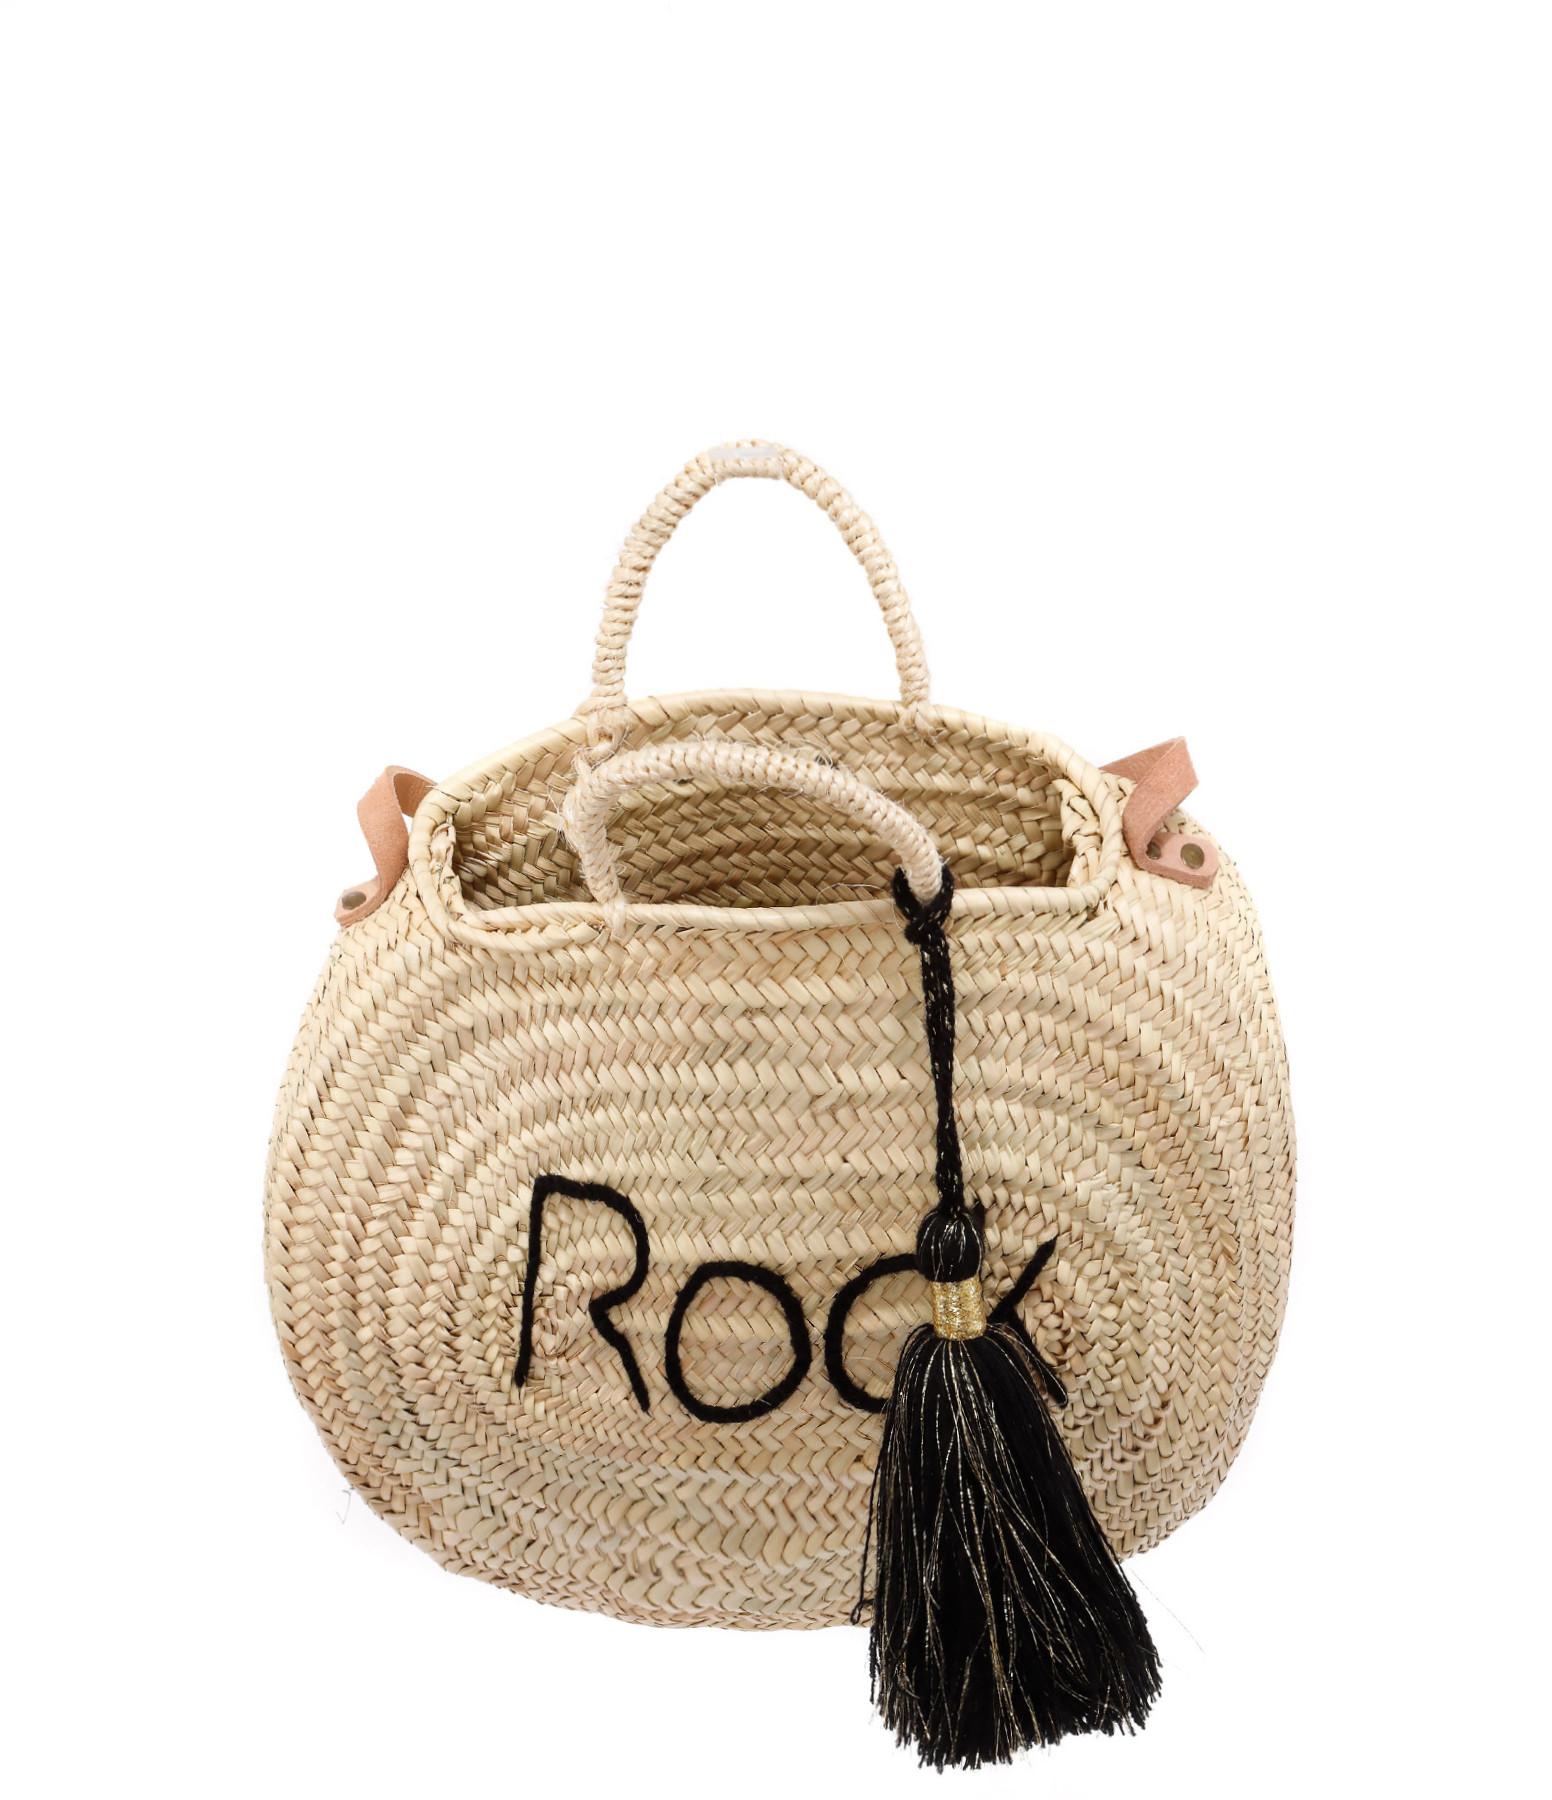 ANATA - Panier Rond Rock Doré